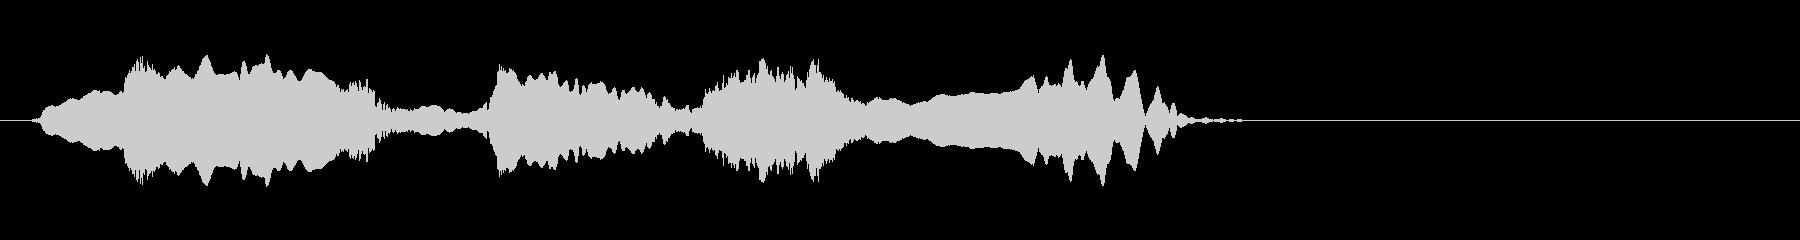 尺八 生演奏 古典風#16の未再生の波形